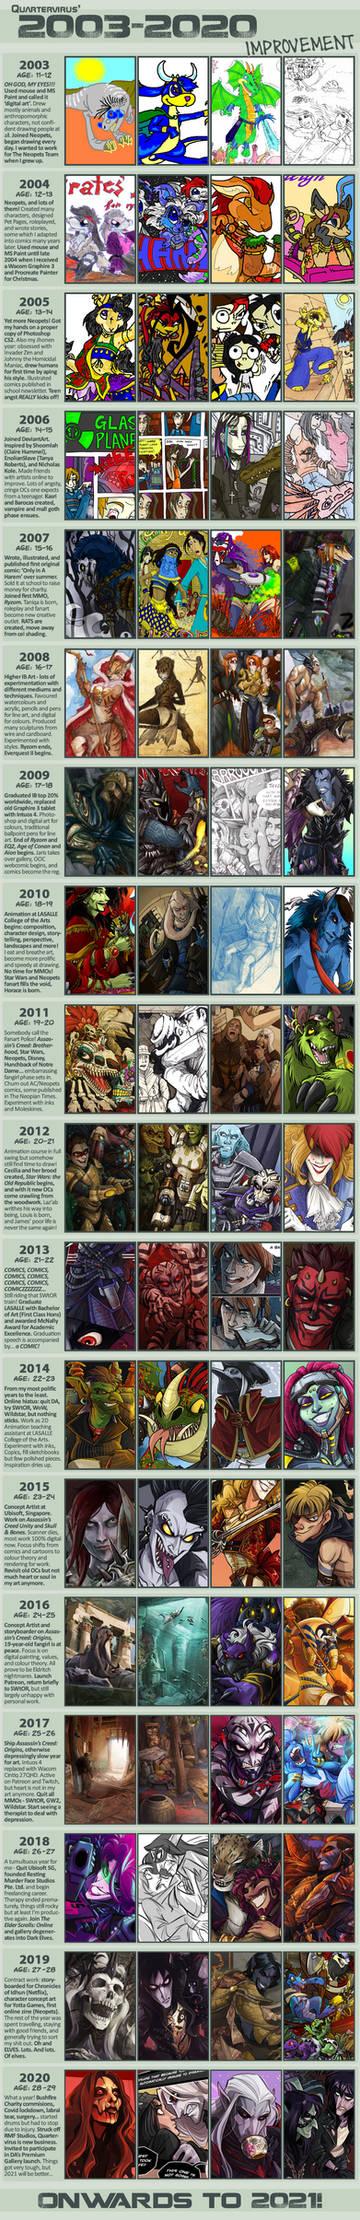 Art Improvement Meme - 2003-2020